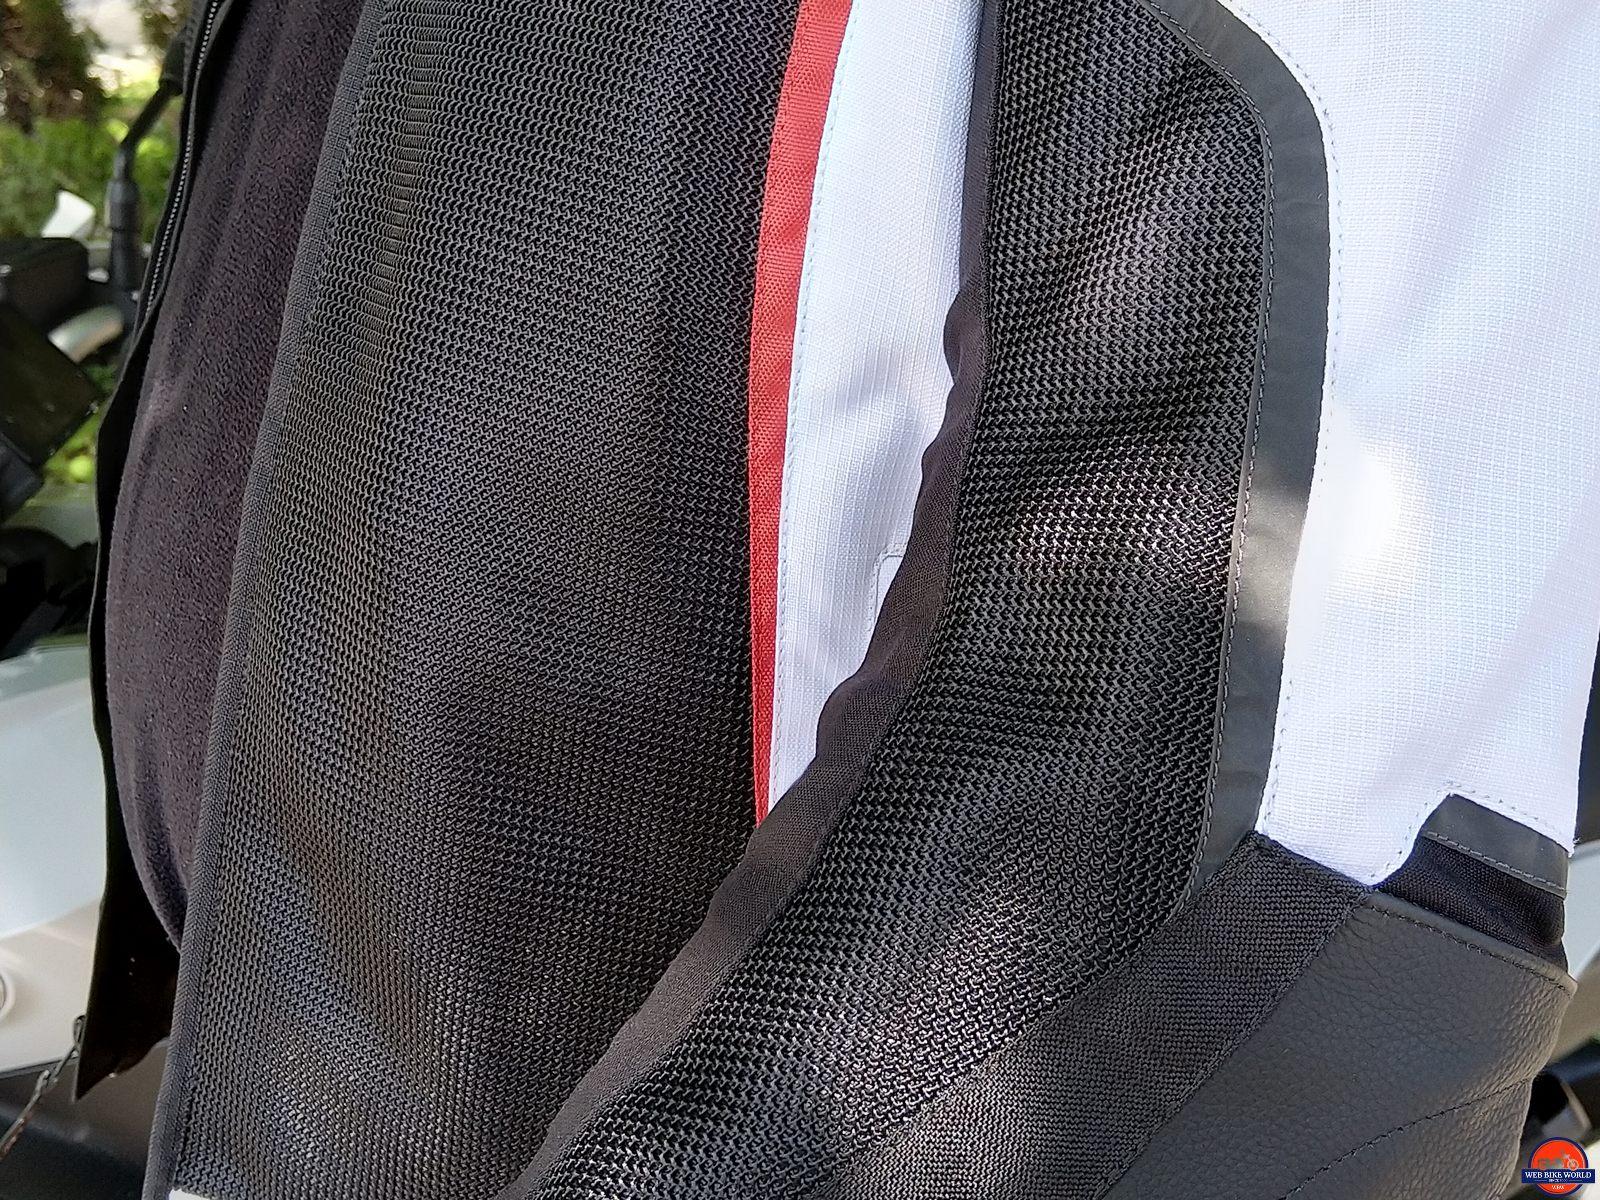 REAX Aprx Pro Mesh Jacket venting